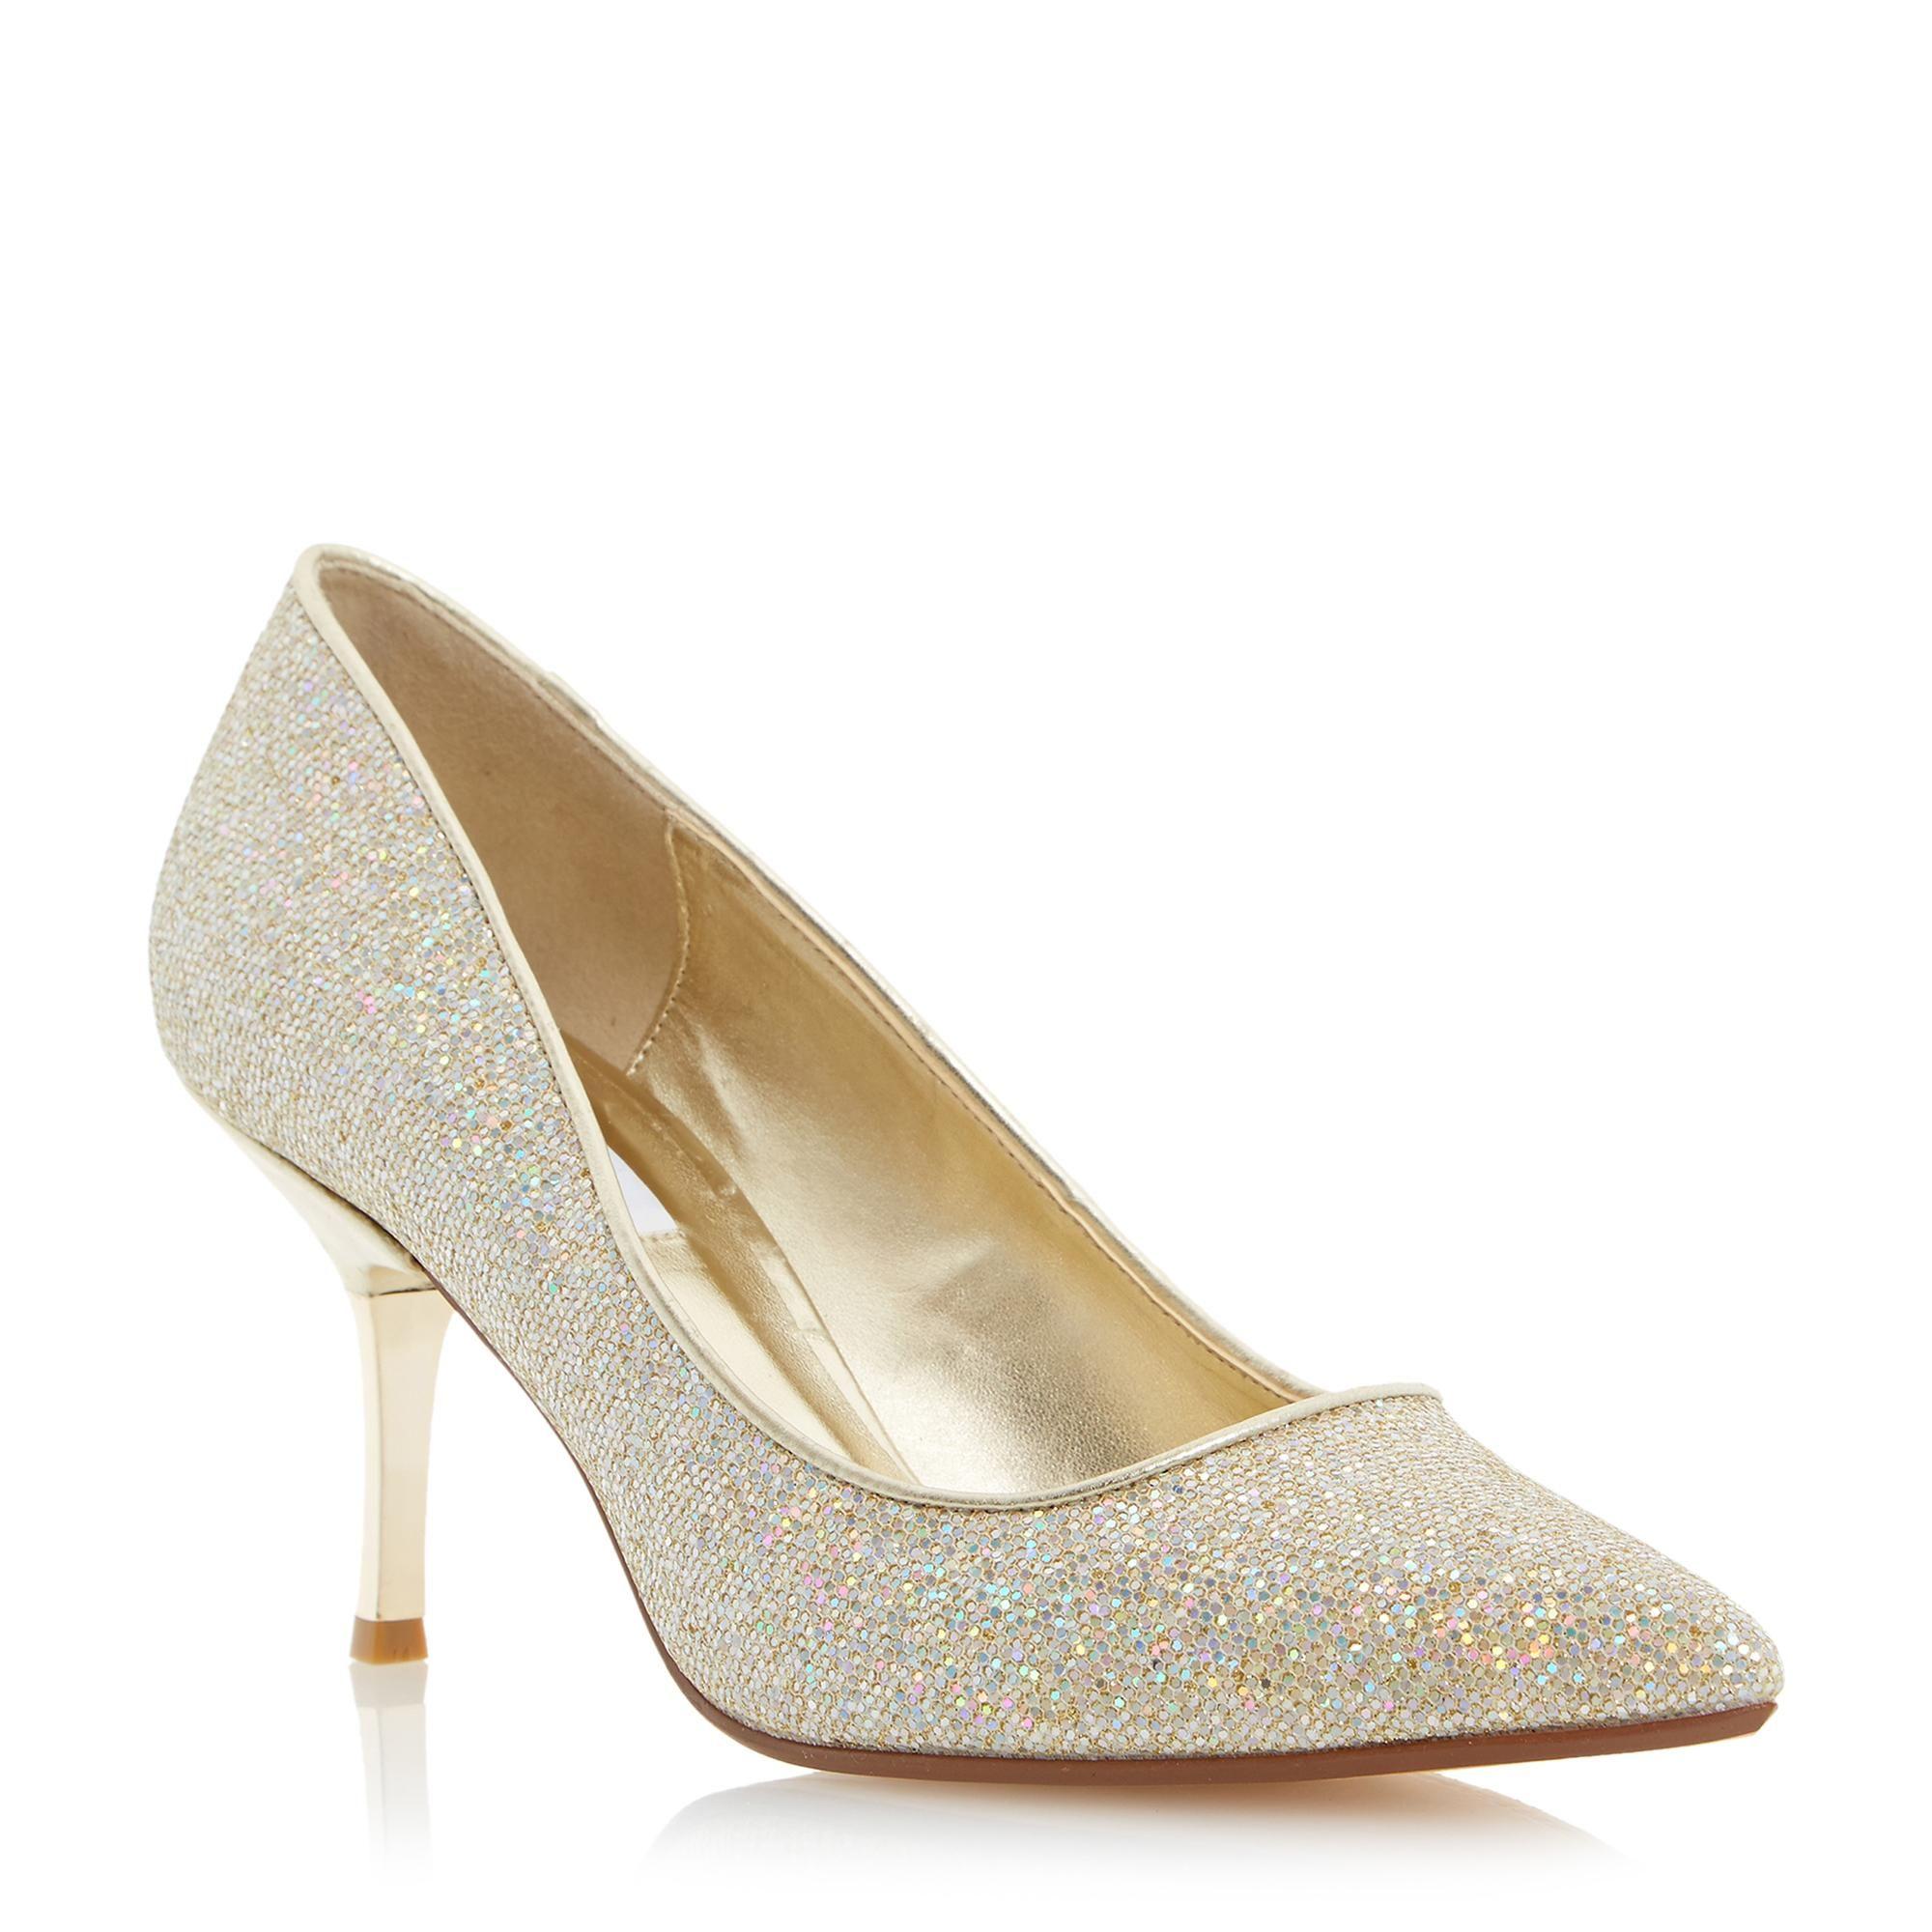 Jewel Trim Suede Flat Shoe - Gold lurex Dune London vSiajiep